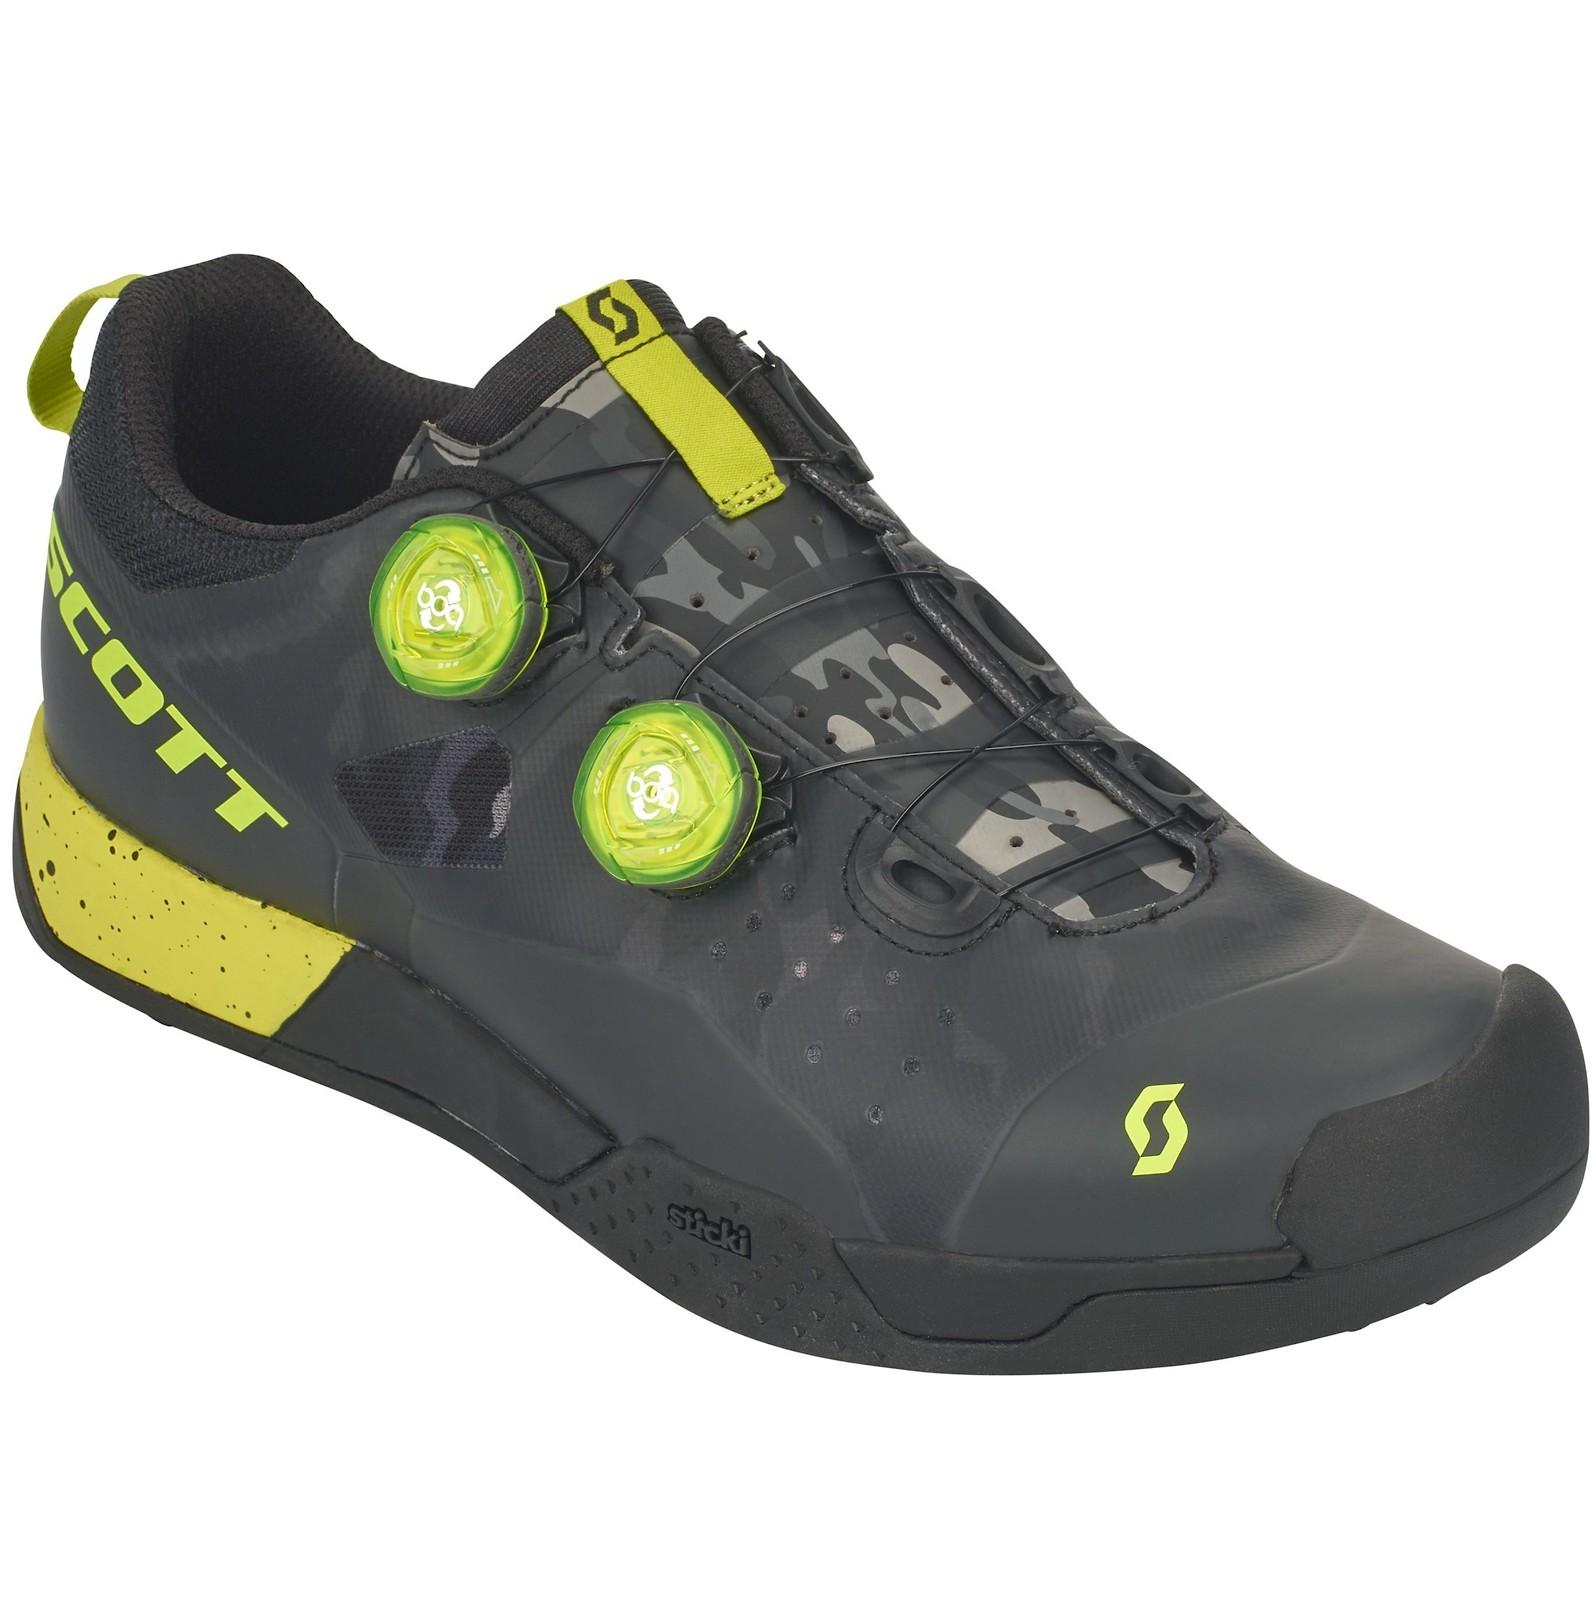 Scott AR Boa Clip shoe in black/sulphur yellow